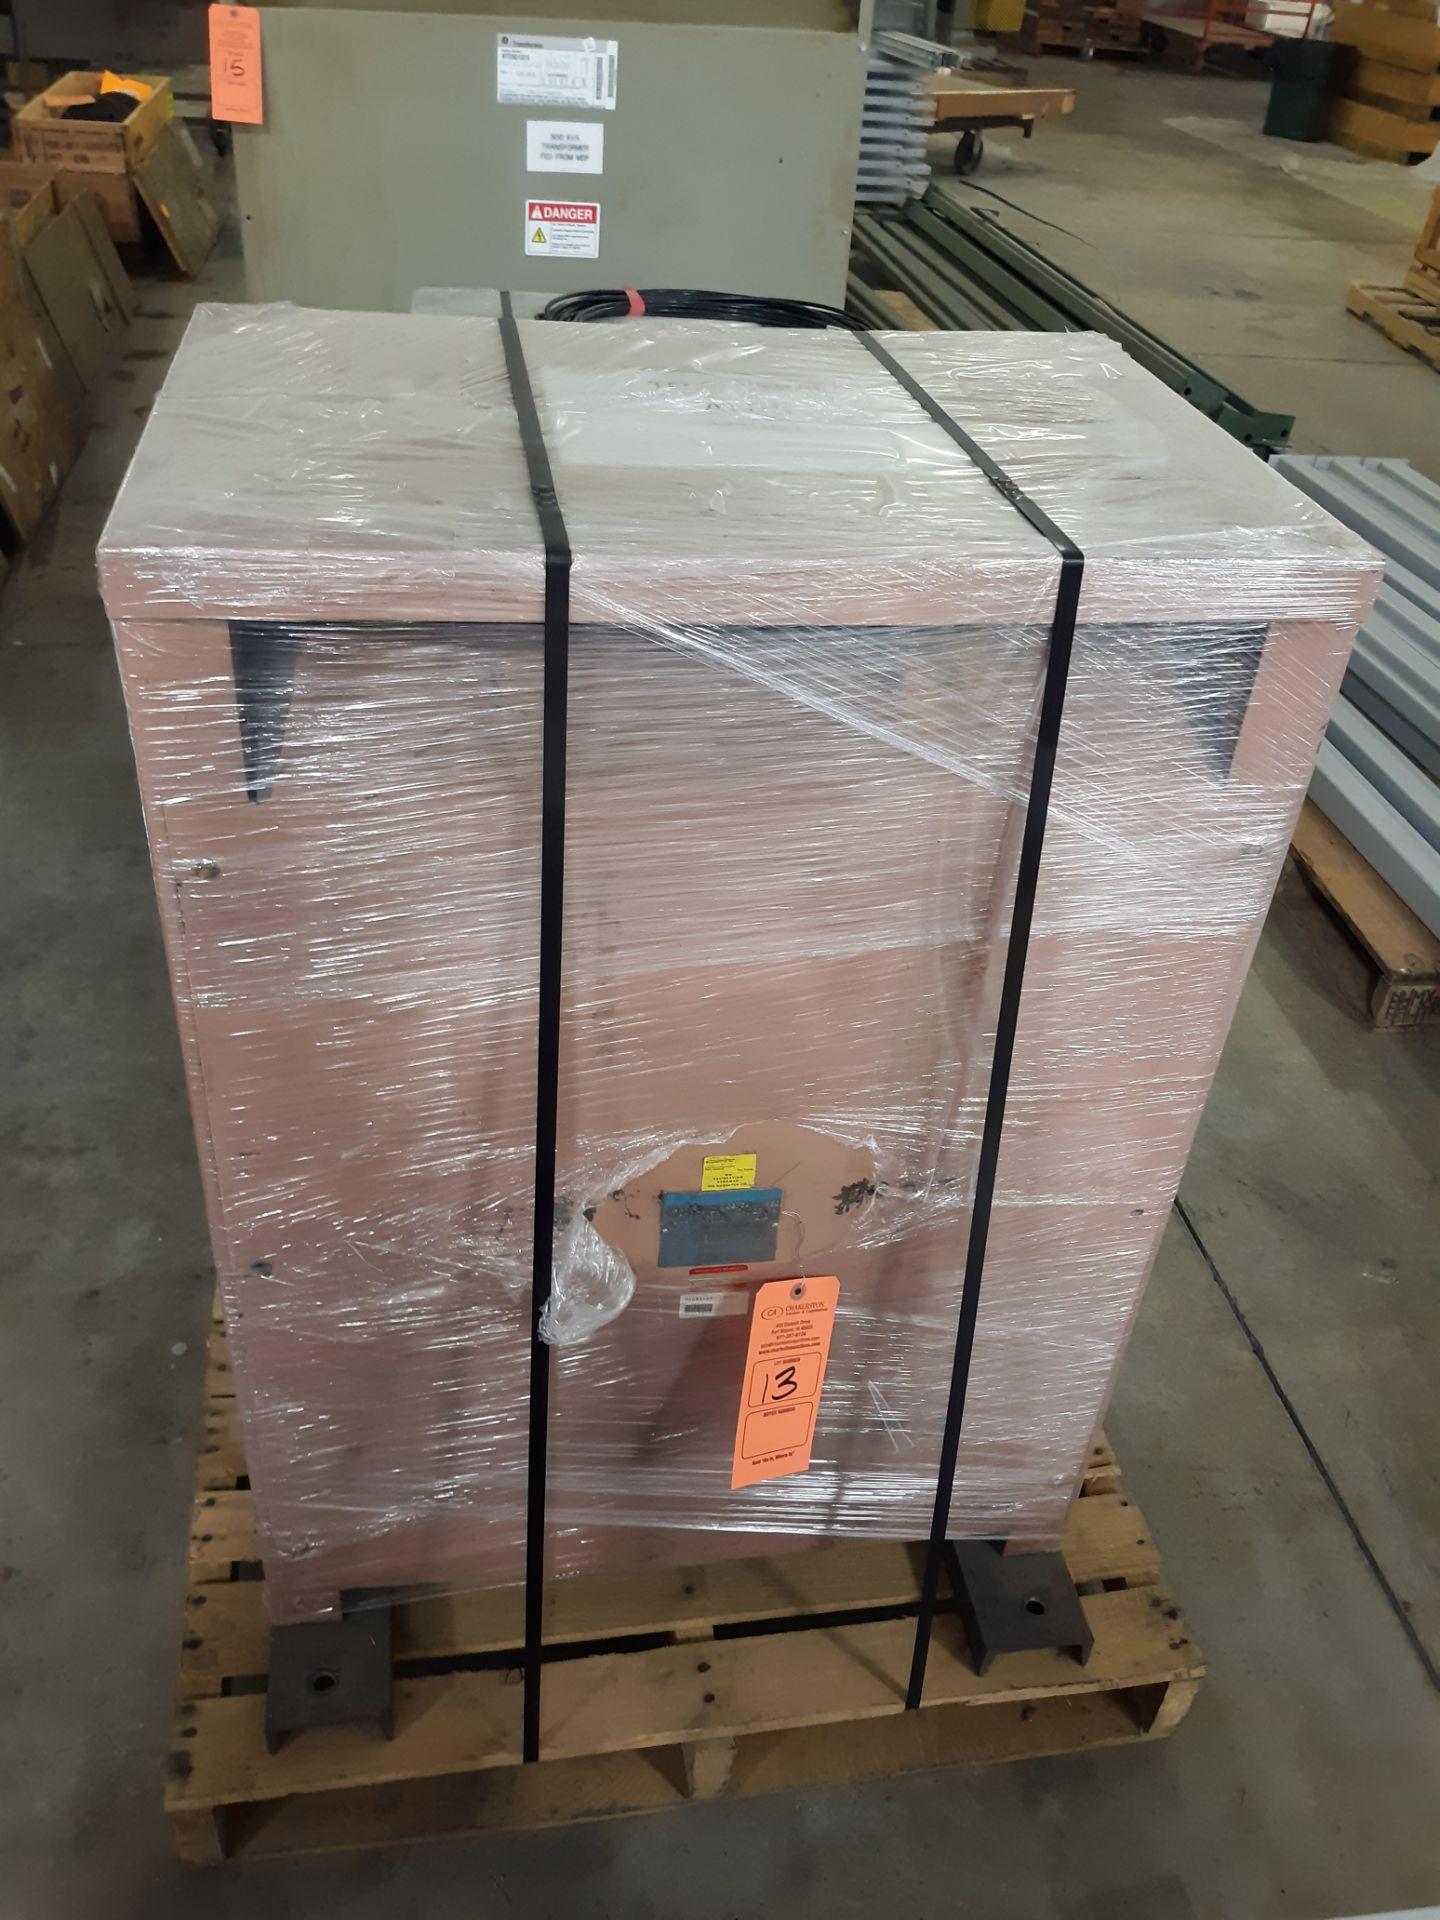 Lot 13 - WESTINGHOUSE TRANSFORMER MODEL-DT-3 112.5 KVA/3PH/60HZ CLASS AA: RIGGING FEE: $10